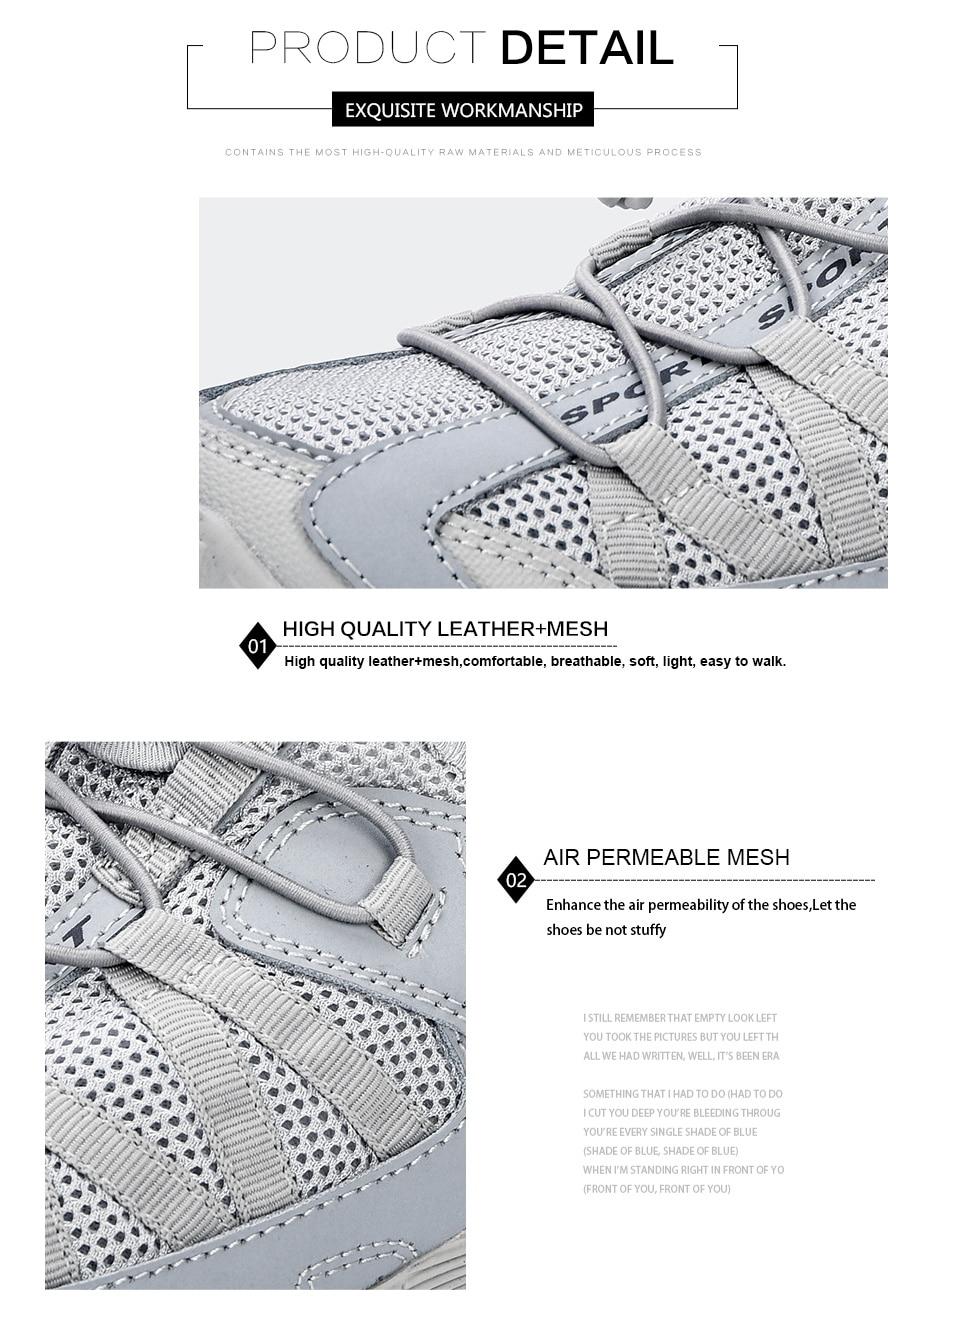 HTB1EKPGc6fguuRjSspaq6yXVXXaT BONA 2018 Summer Sneakers Breathable Men Casual Shoes Fashion Men Shoes Tenis Masculino Adulto Sapato Masculino Men Leisure Shoe